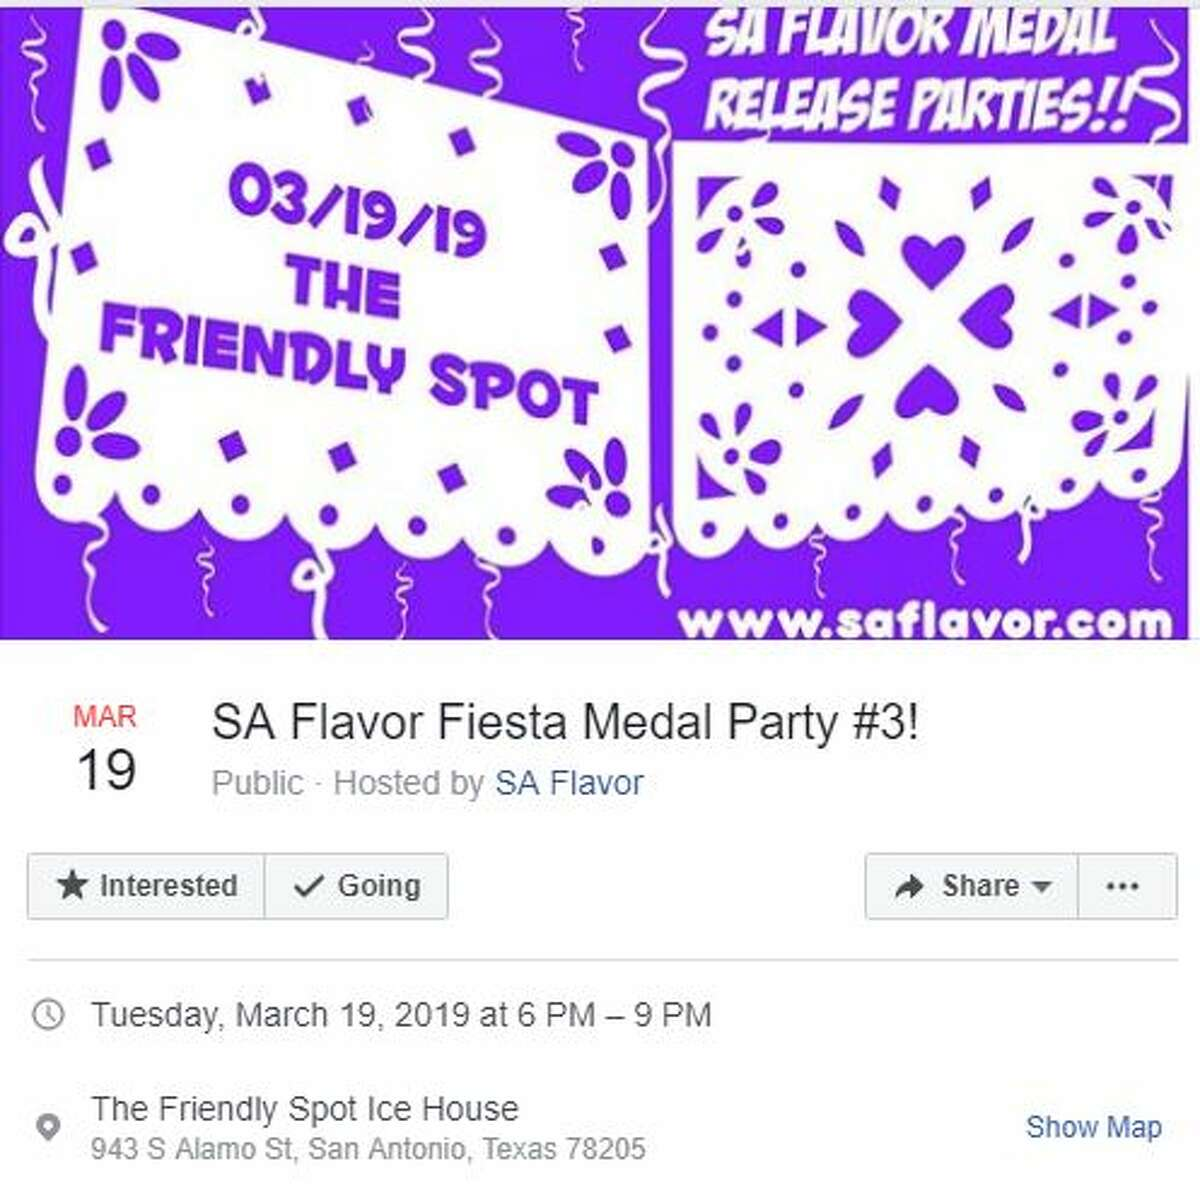 SA Flavor Fiesta Medal Party #3! Tuesday, March 19, 2019, 6-9 p.m. Friendly Spot Ice House, 943 S. Alamo St., San Antonio, TX, 78205